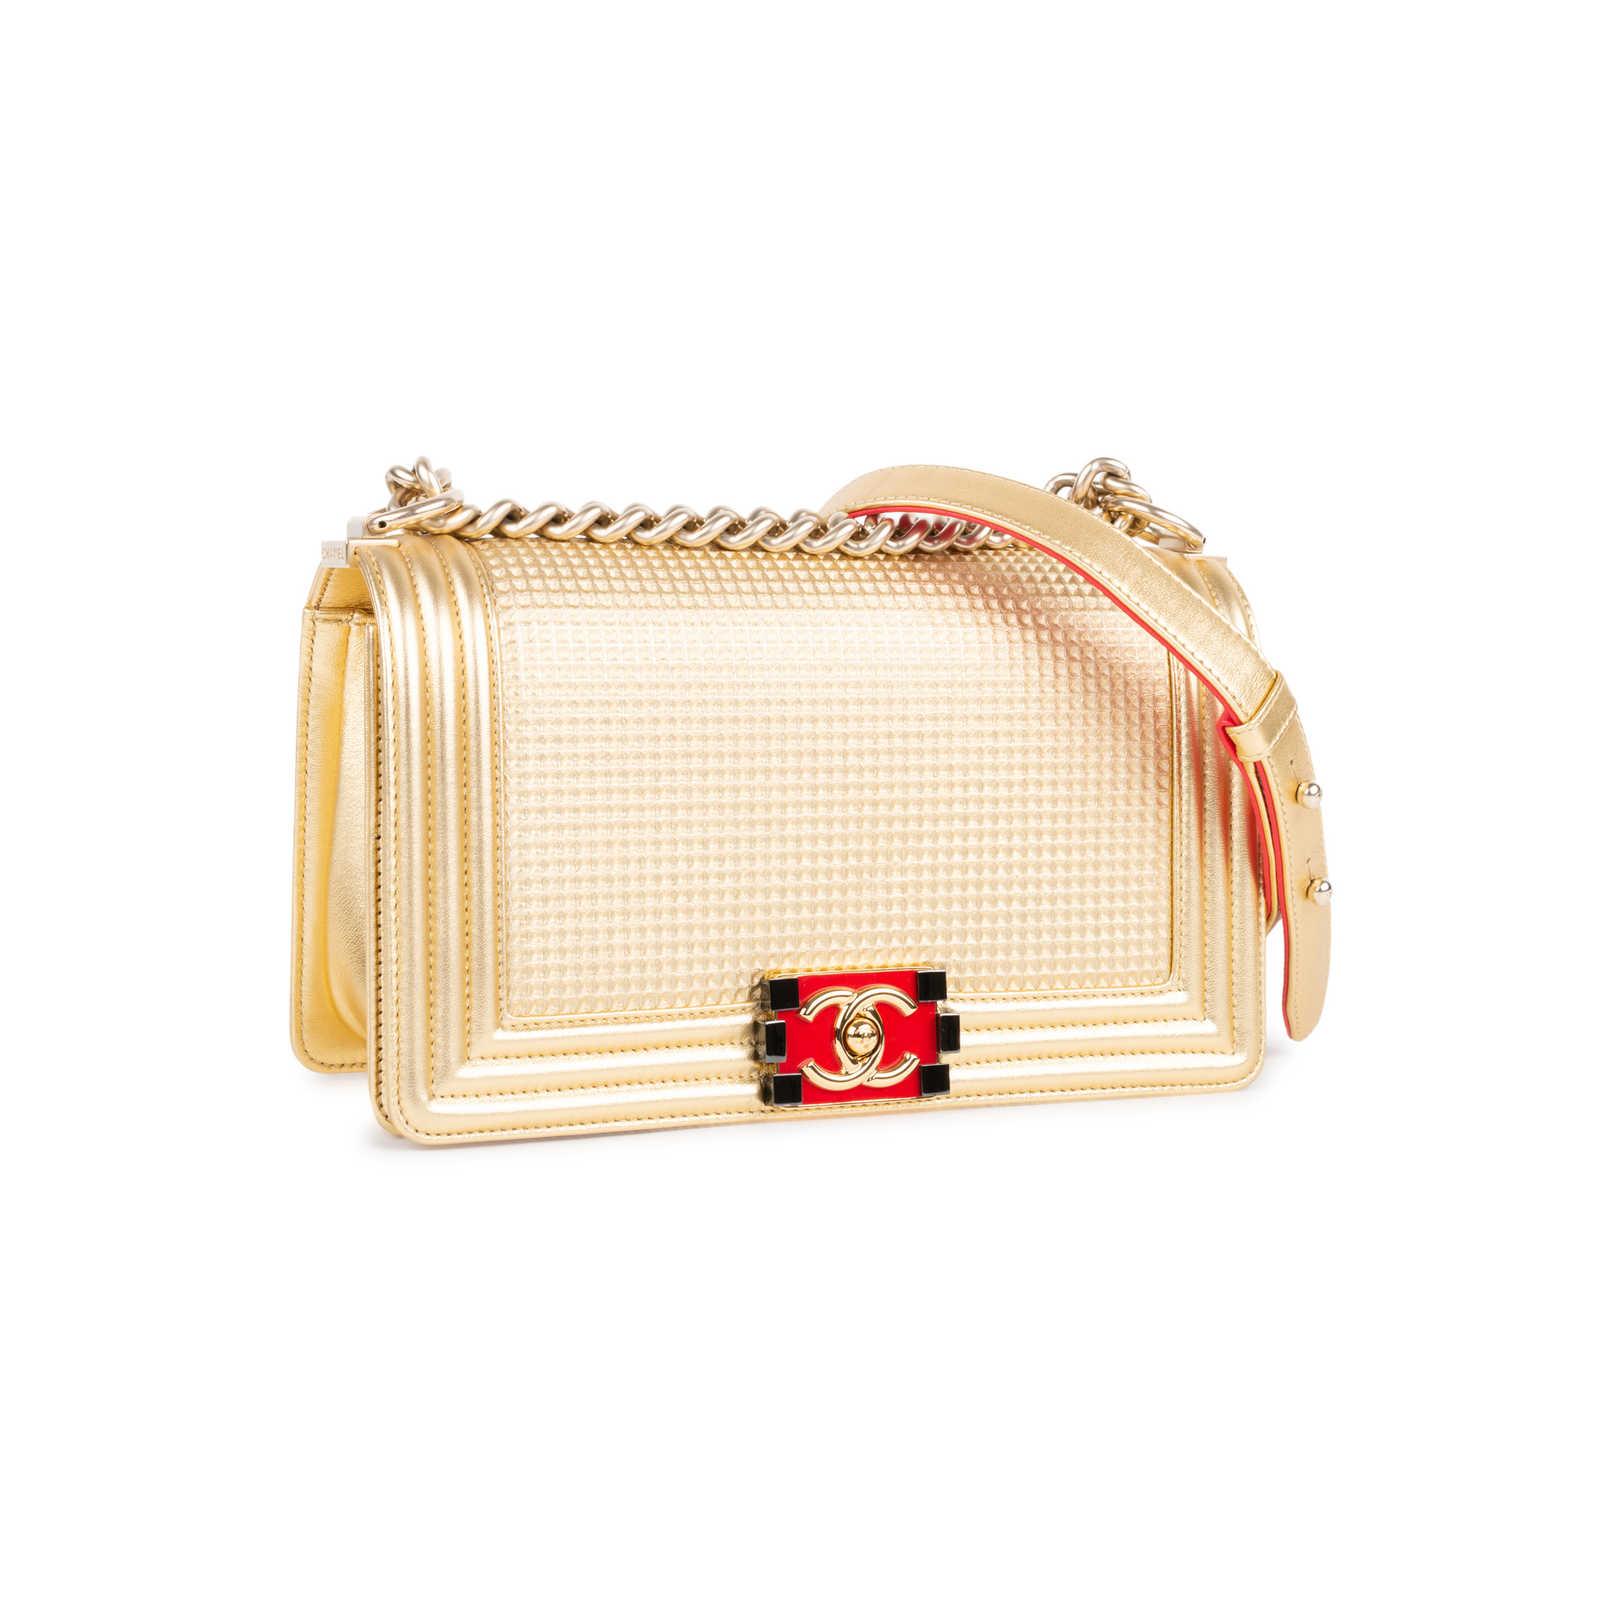 c0606f86ecc6 ... Authentic Second Hand Chanel Cube Boy Medium Bag (PSS-333-00060) ...